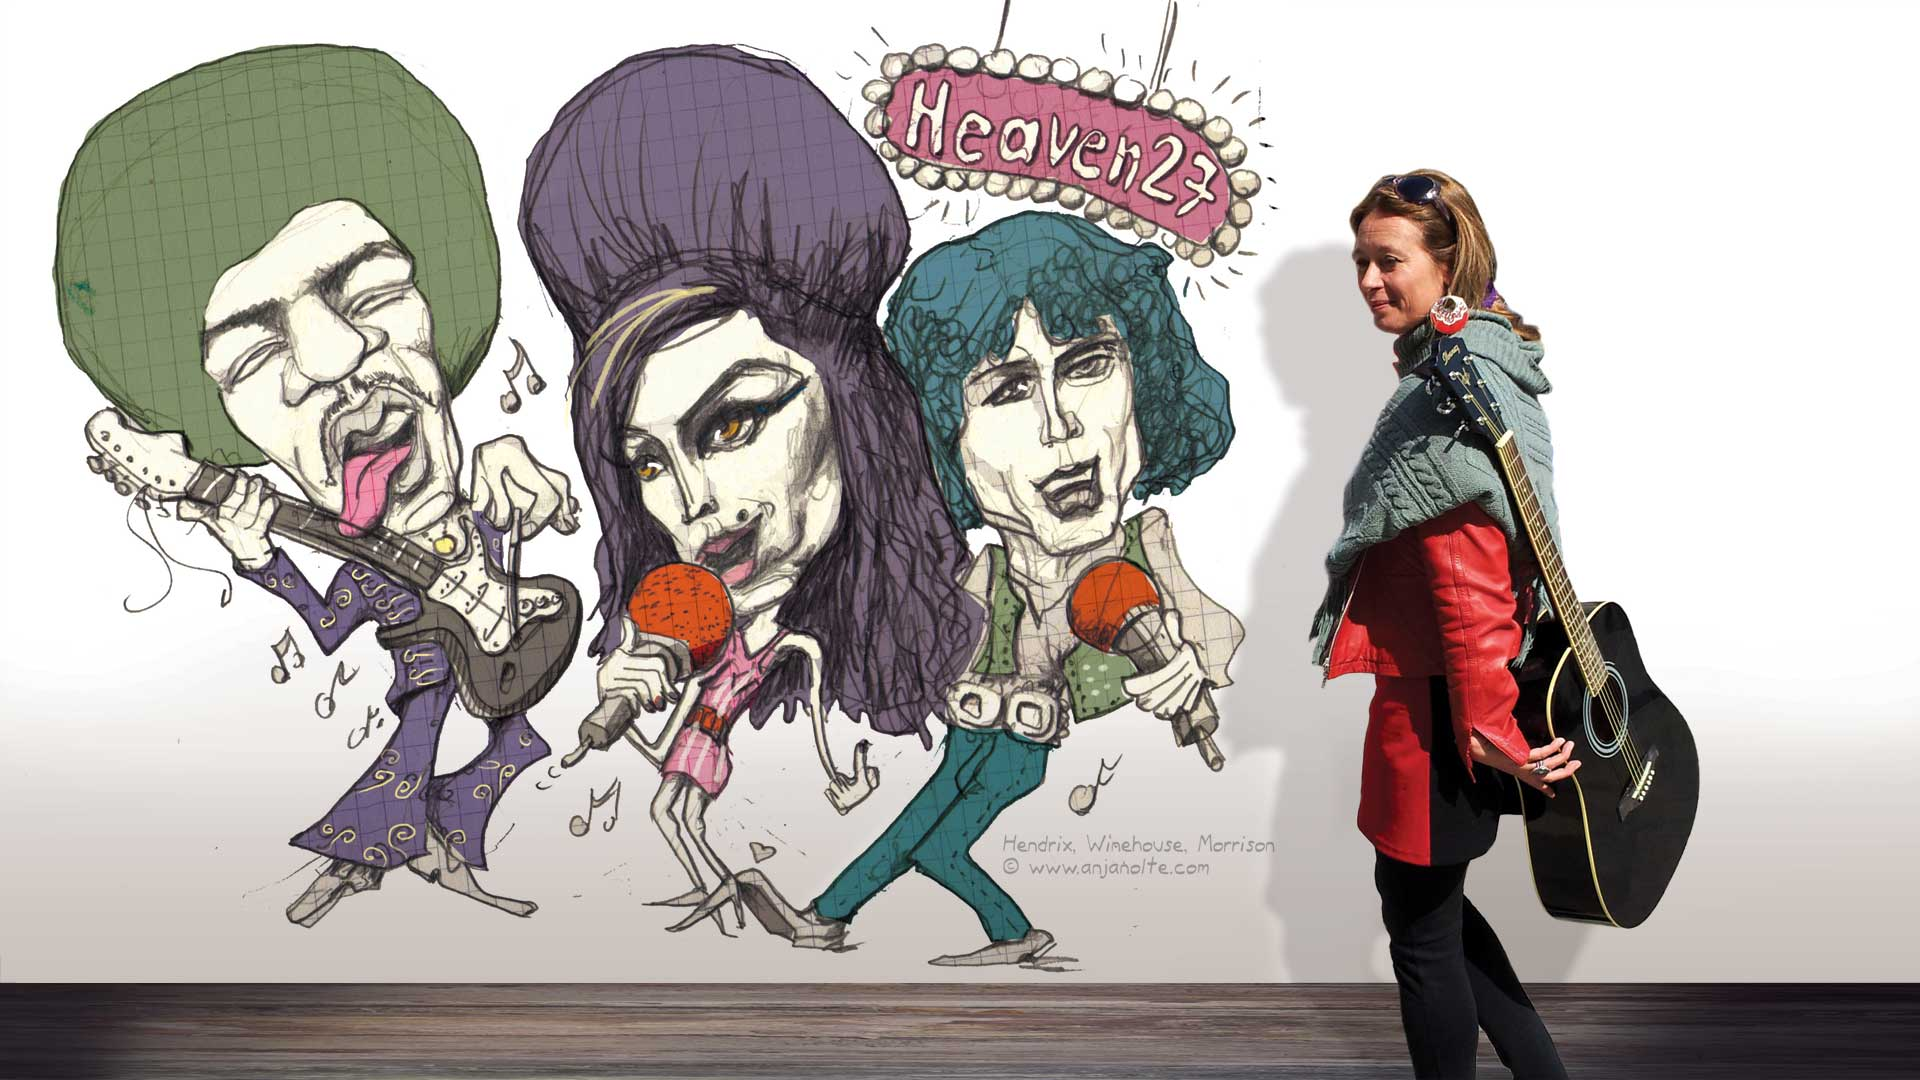 Foto Anja Nolte vor Karikatur Amy Winehouse Jim Hendrix Van Morrison © www.anjanolte.com